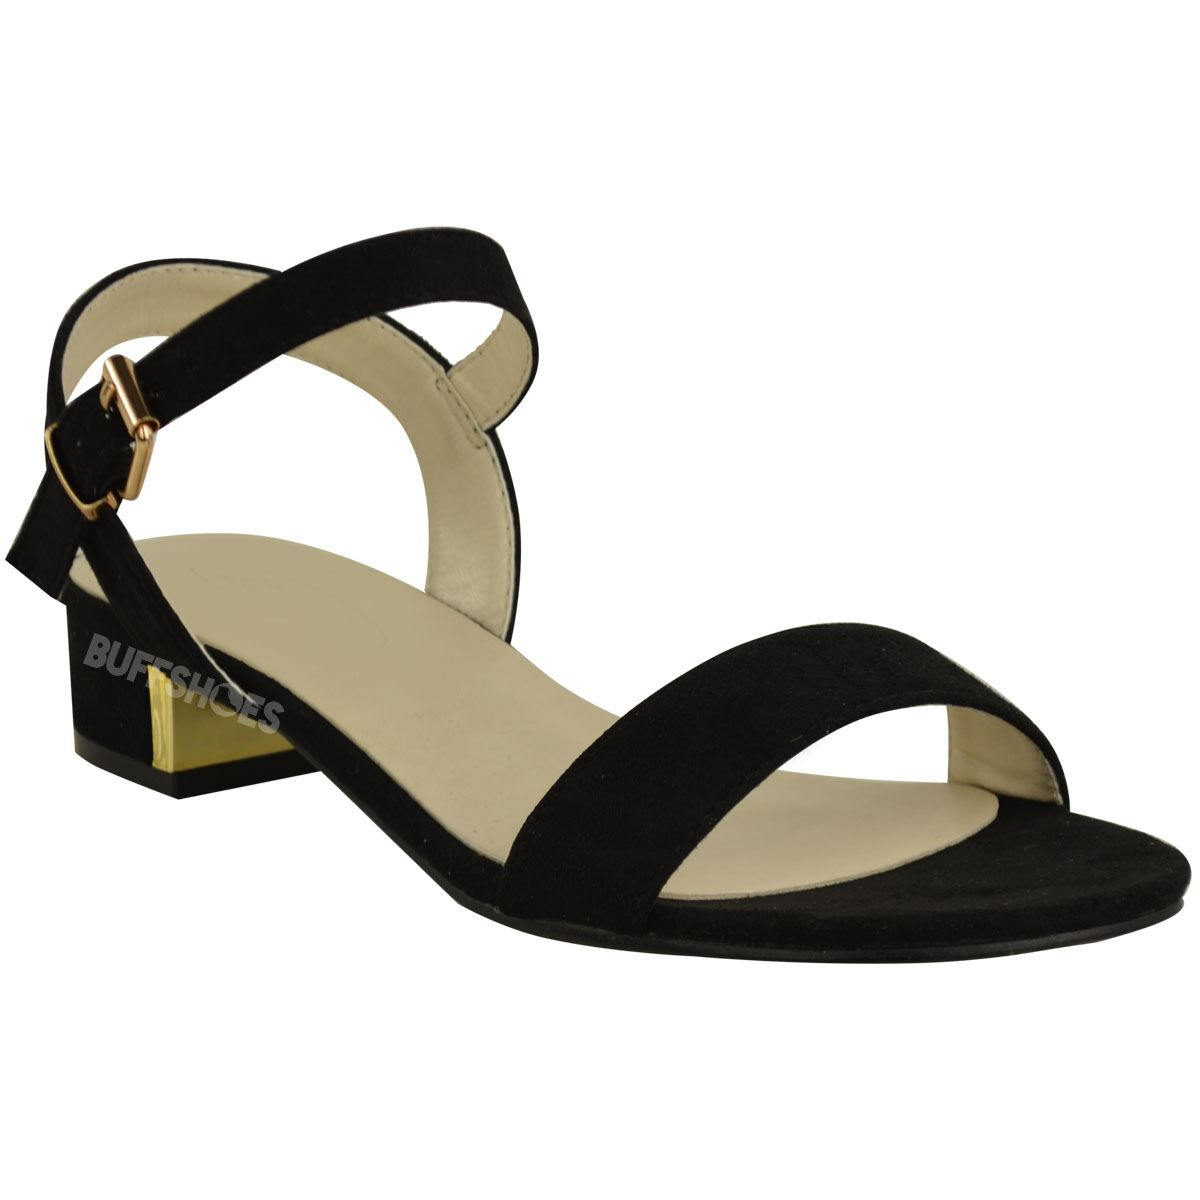 a4541a257 Womens Ladies Low Flat Block Heel Open Toe Summer Sandals Black ...